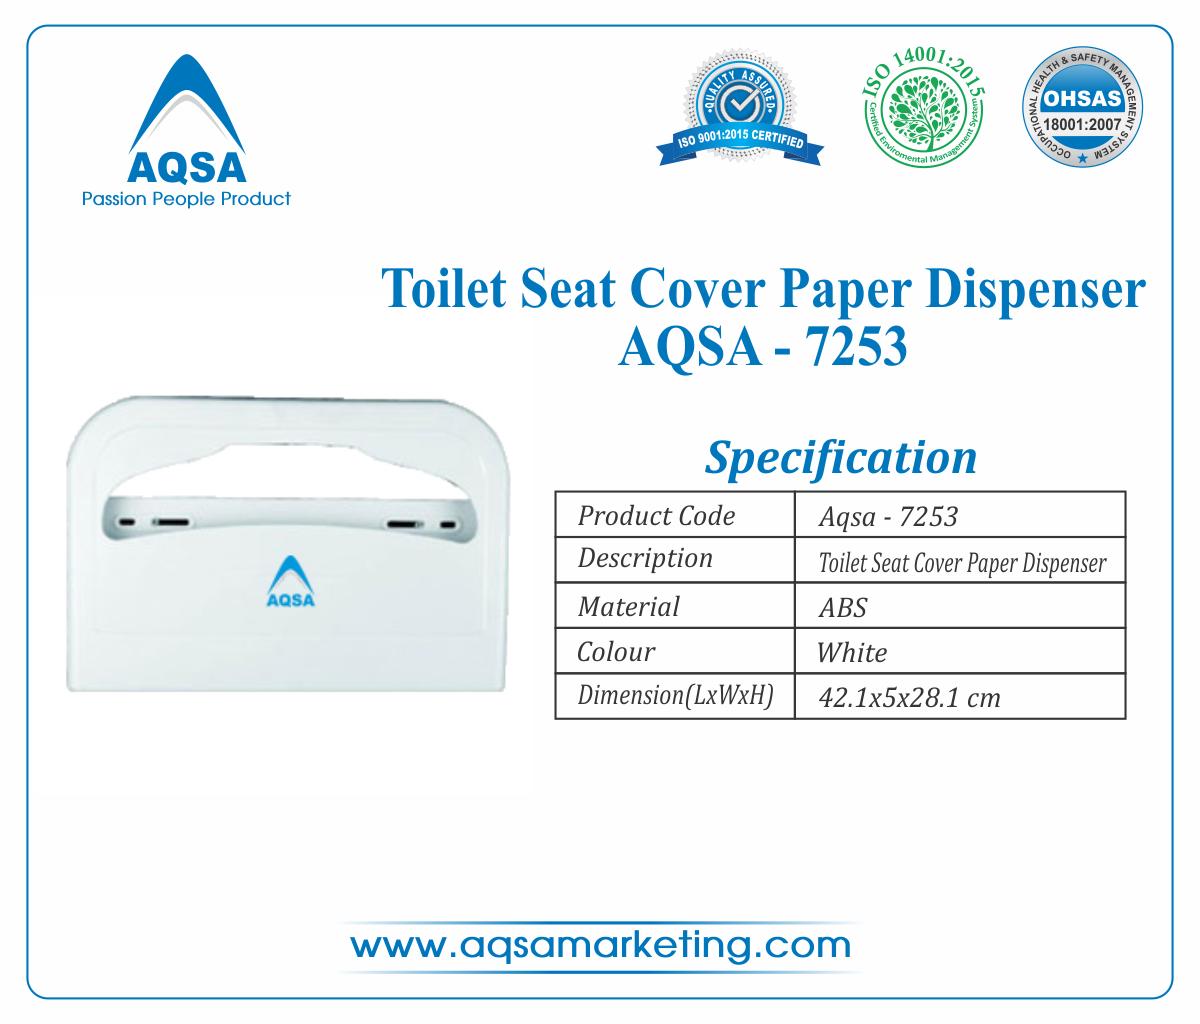 Toilet Seat Cover Paper Dispenser AQSA-7253 image